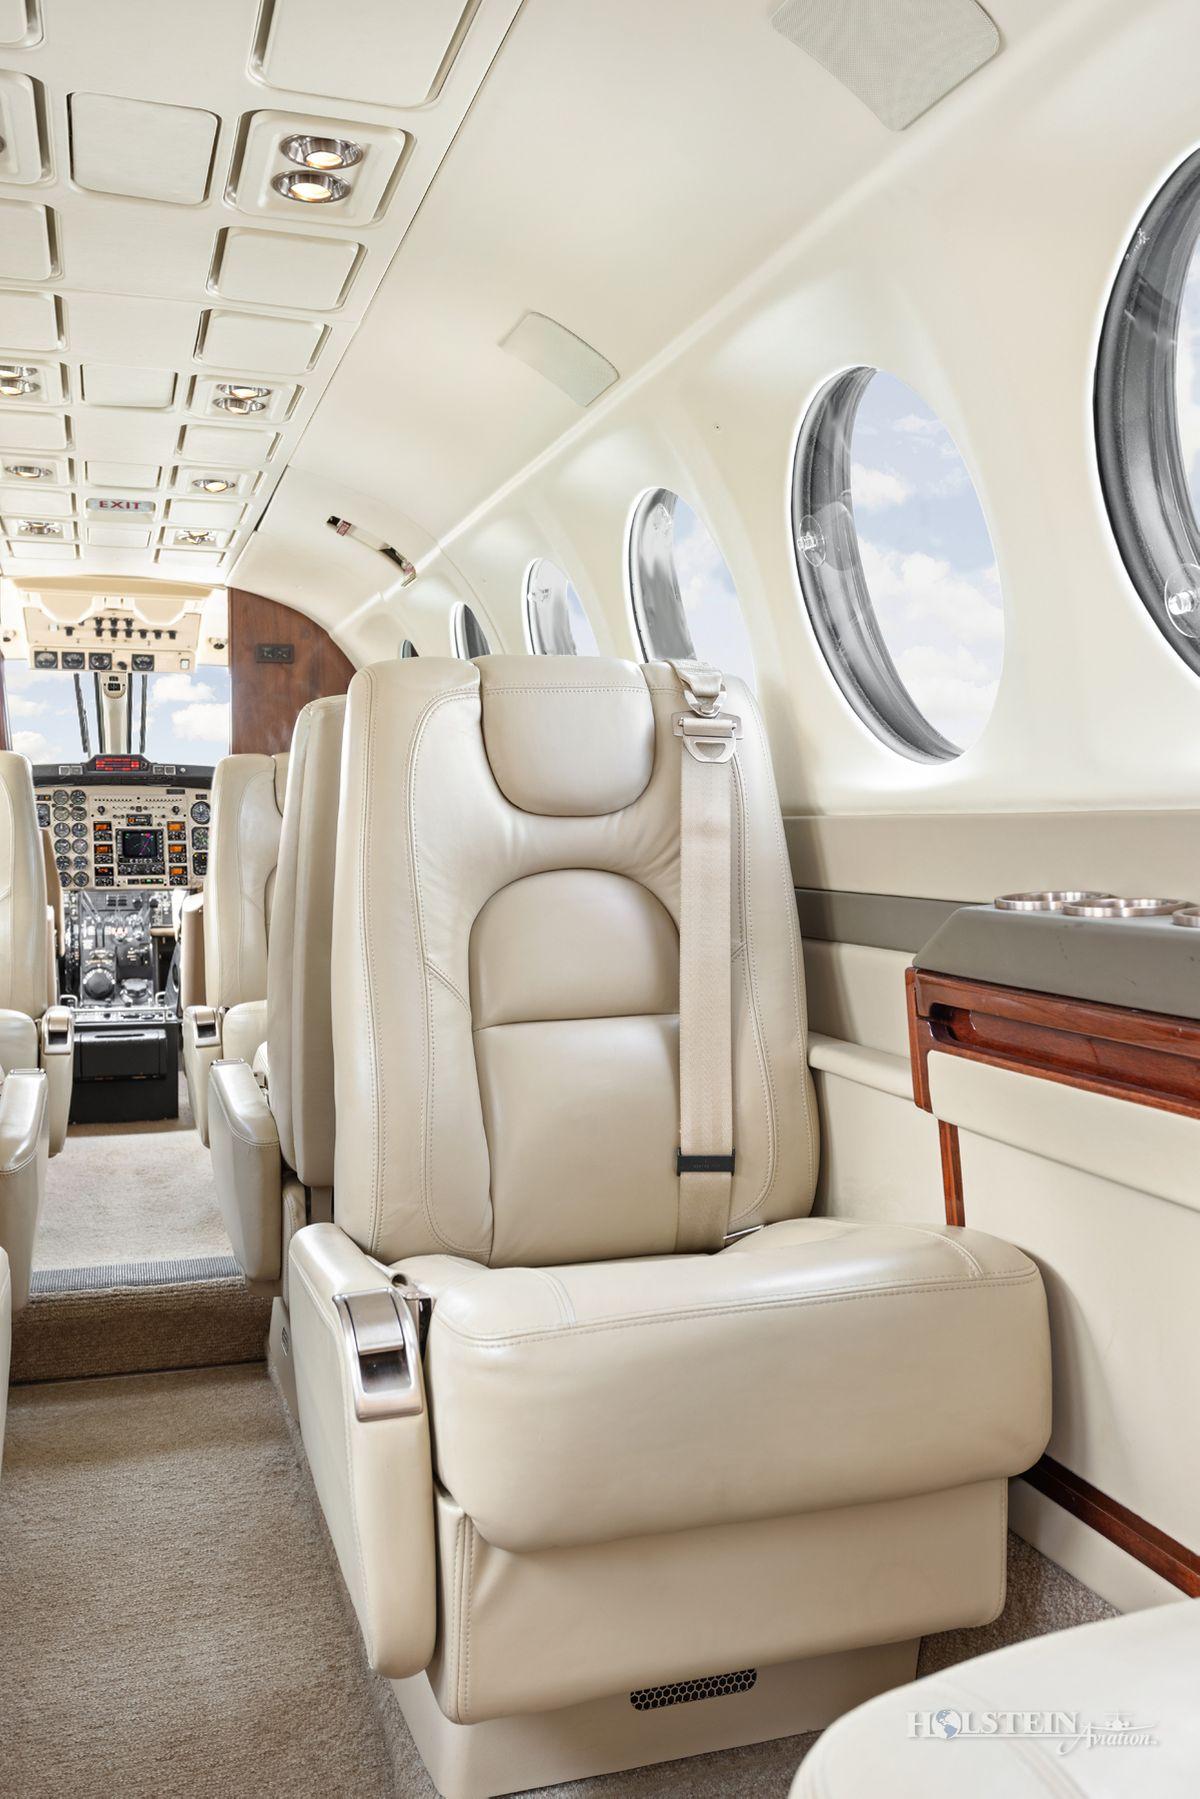 2002 King Air 350 - FL-355 - N685BC - Int - Cabin Seat CU RGB.jpg